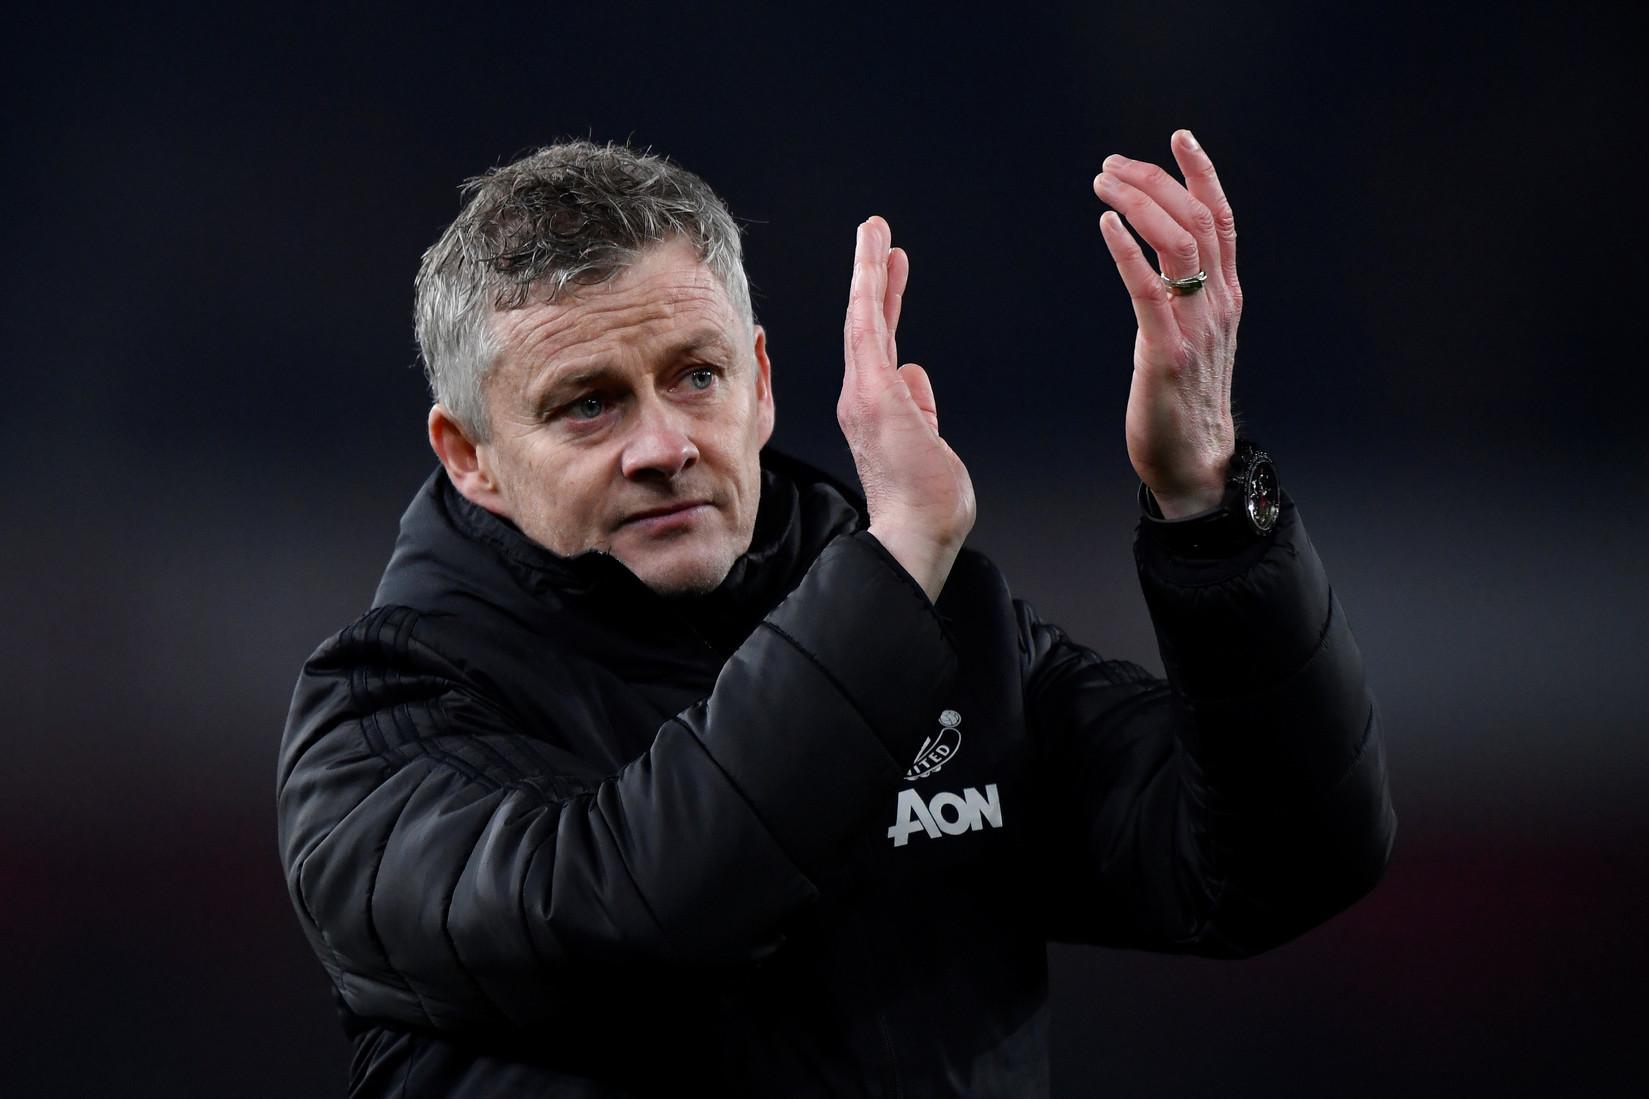 Ole Gunnar Solskjær, Manchester United, England